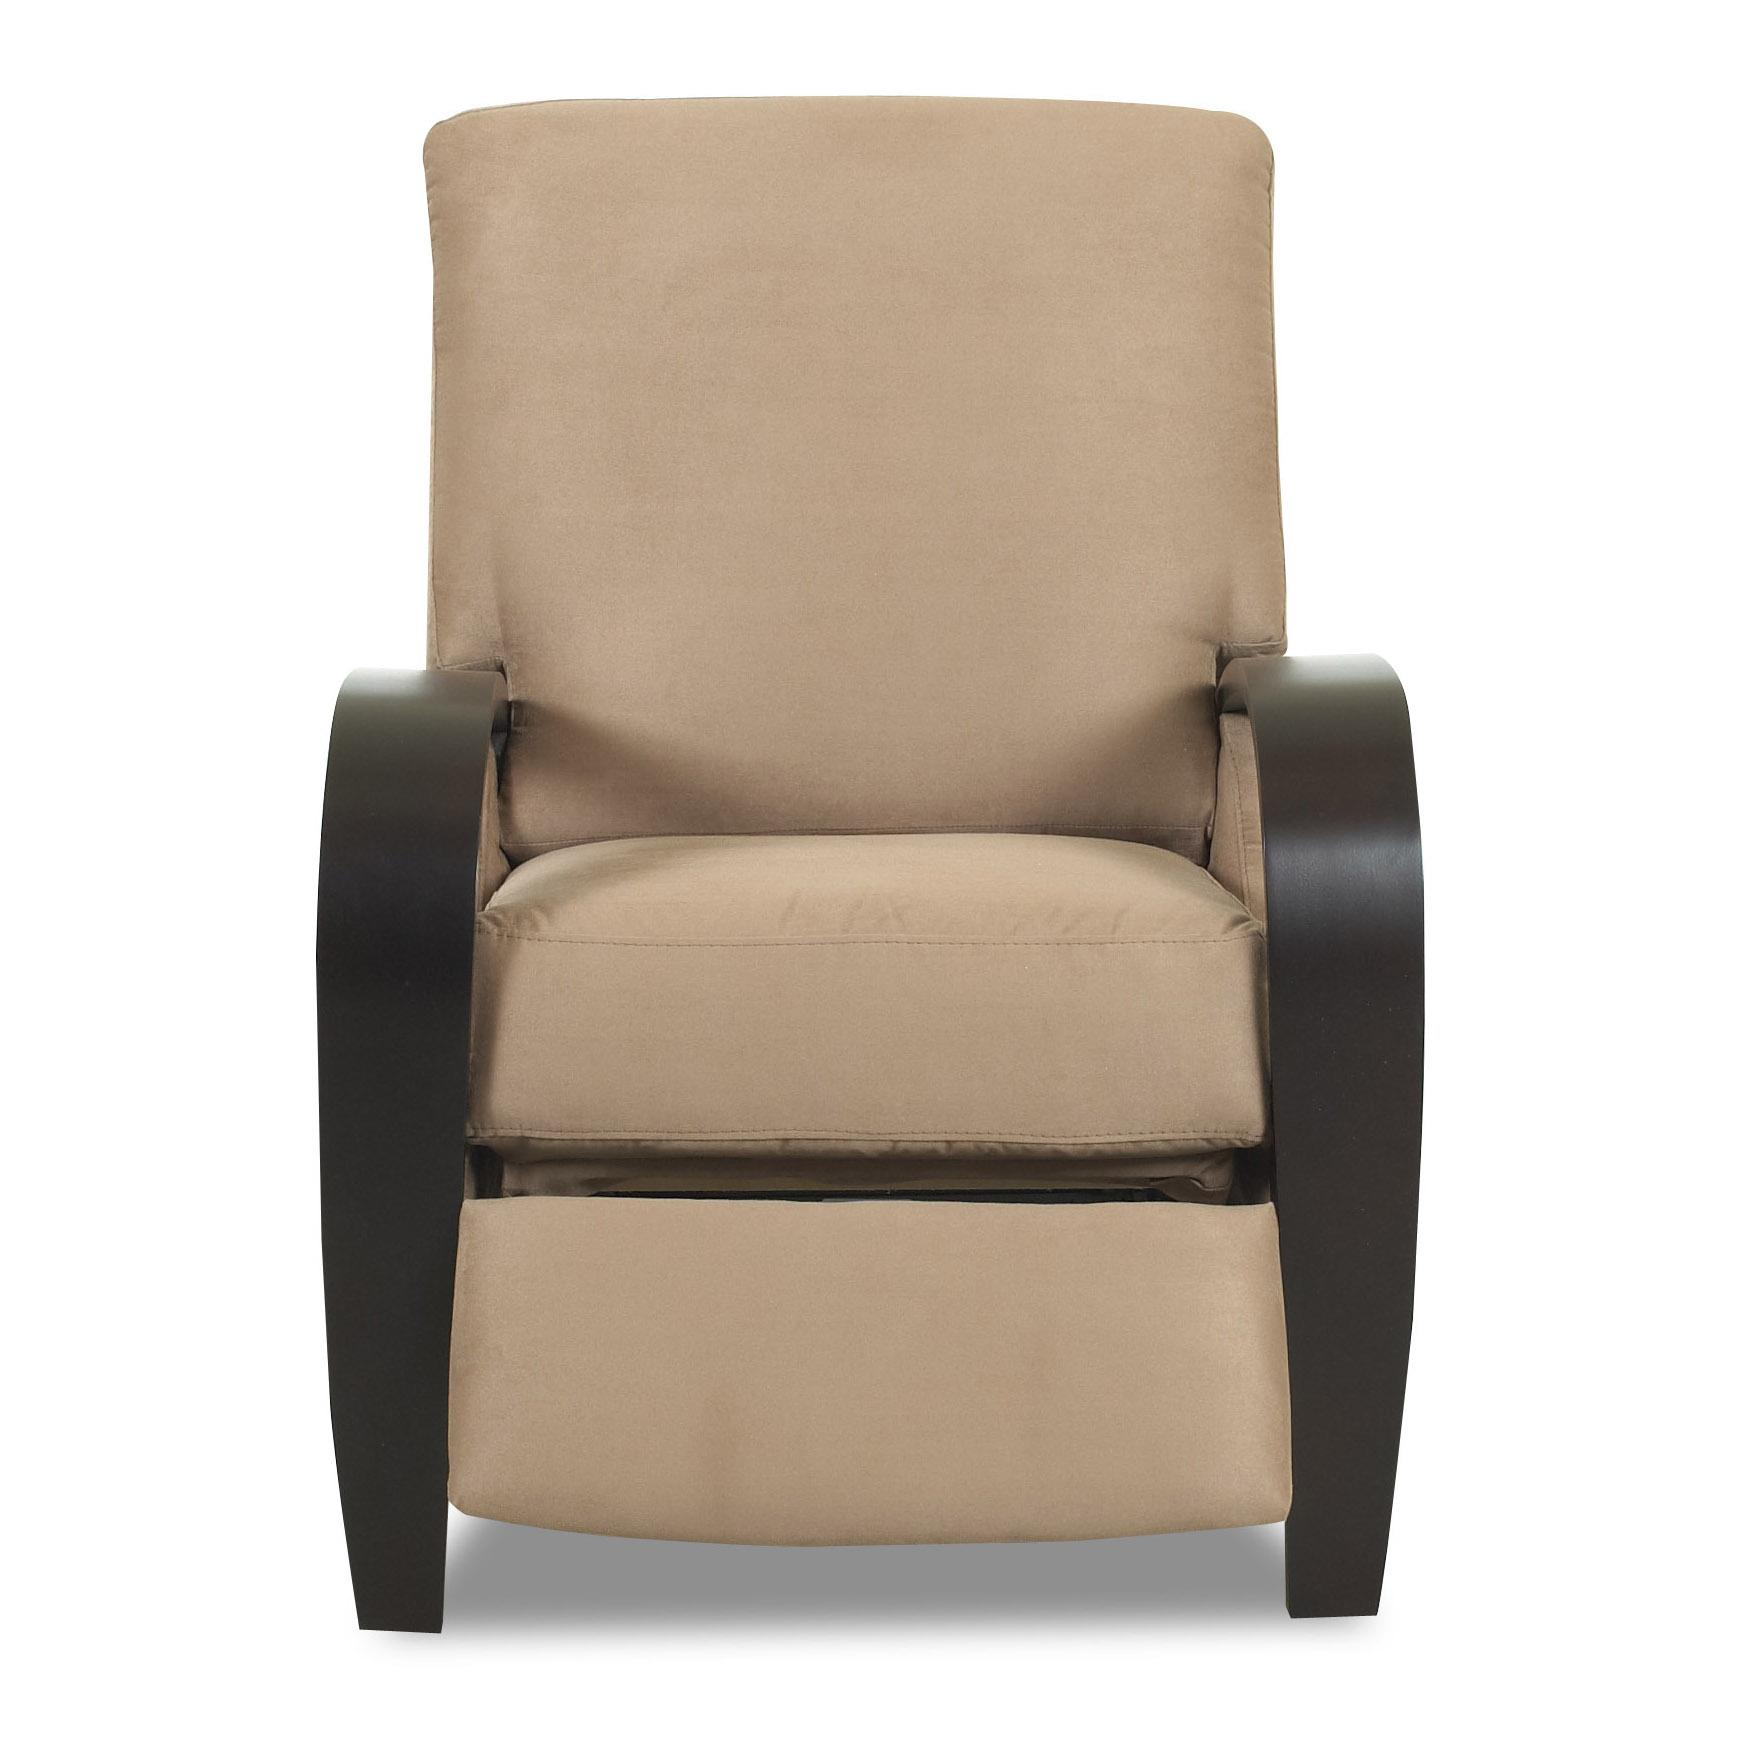 High leg reclining chairs - Ralph High Leg Reclining Chair